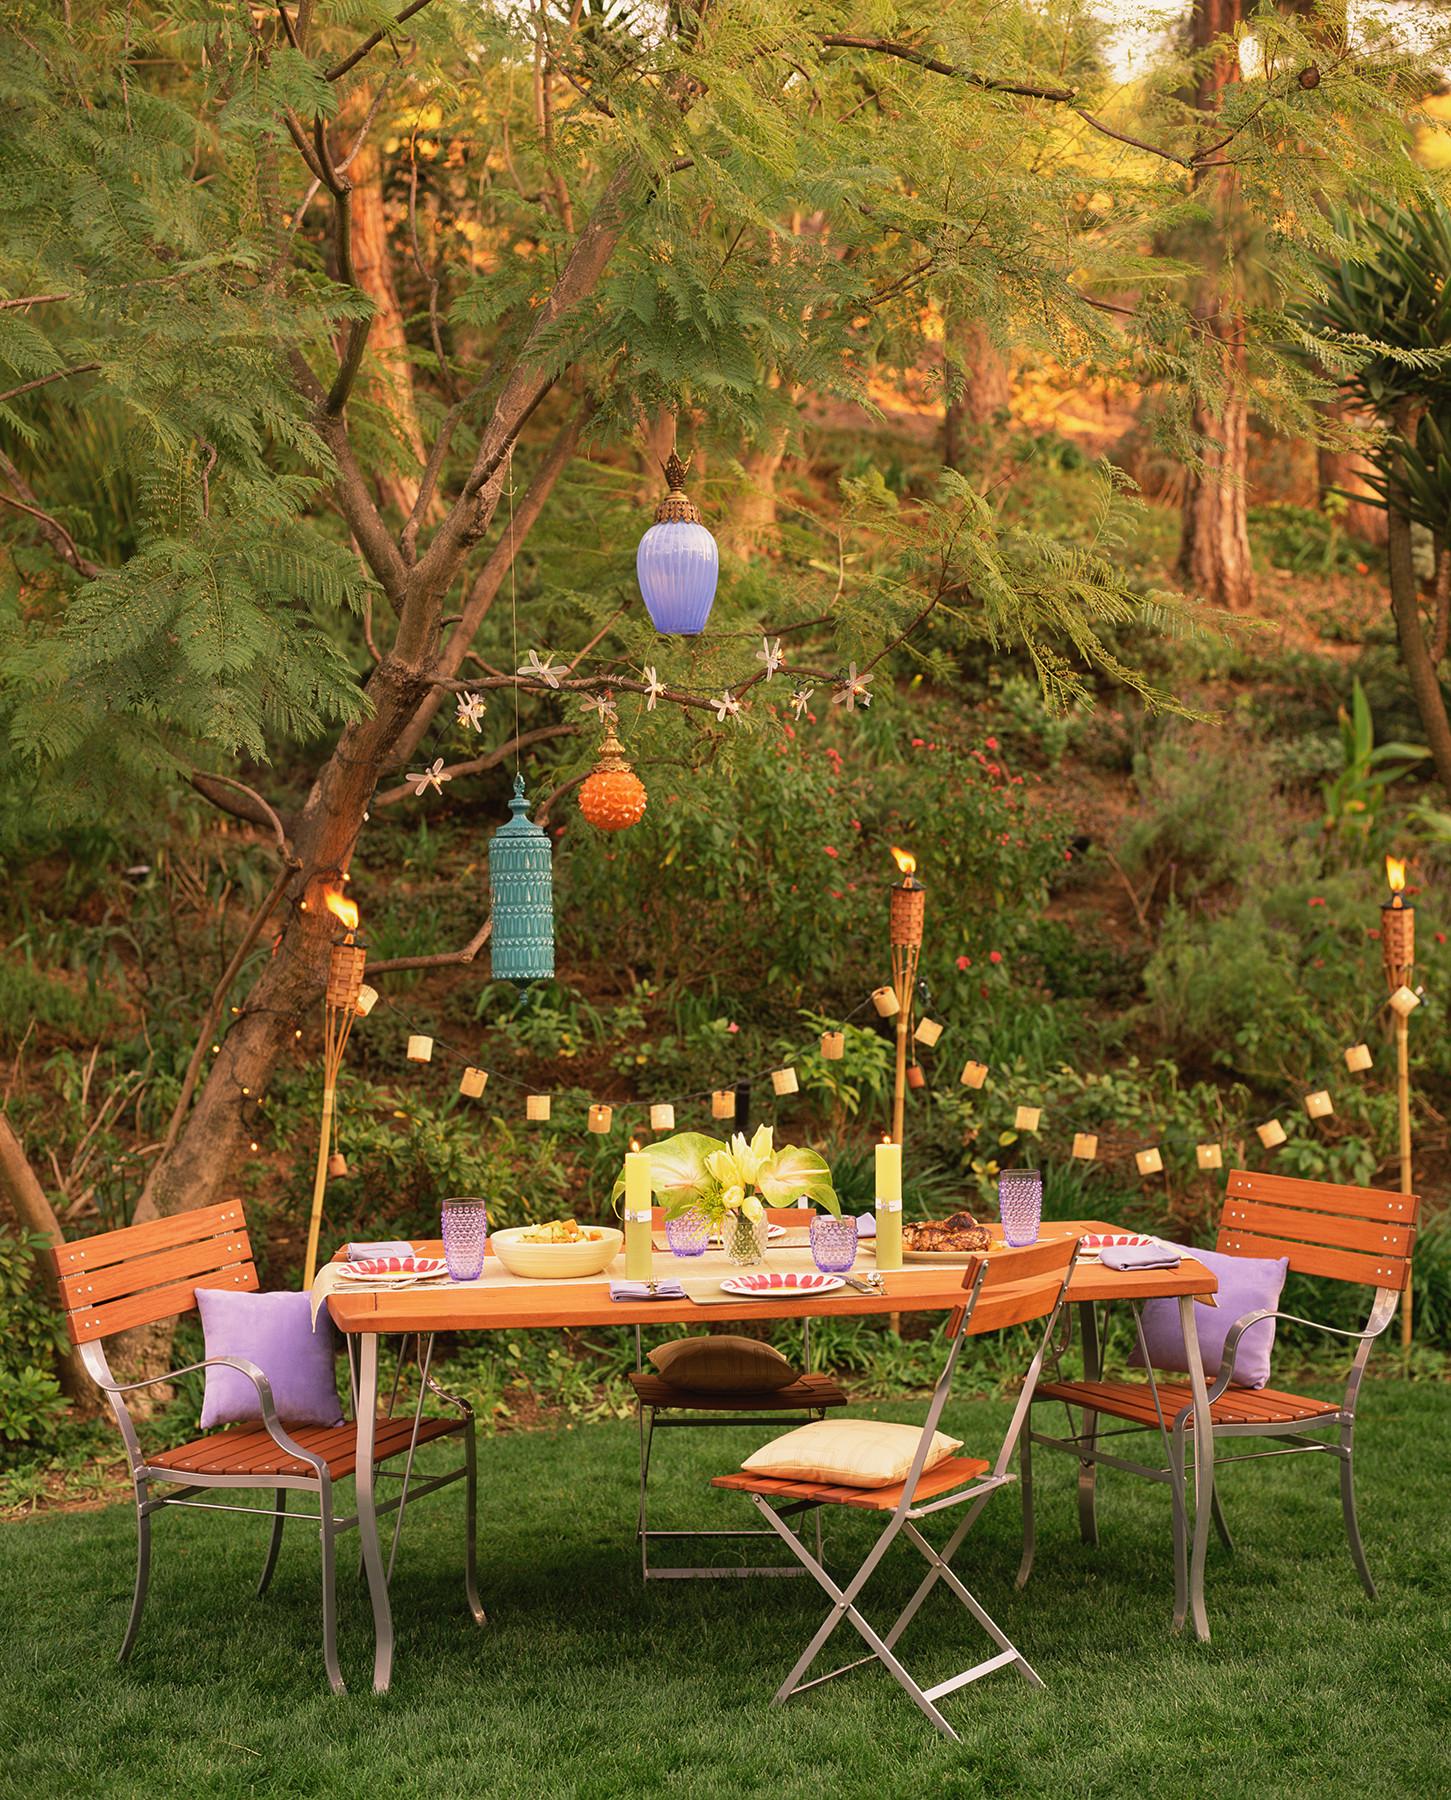 Outdoor Beach Party Ideas  17 Outdoor Party Ideas for an Effortless Backyard